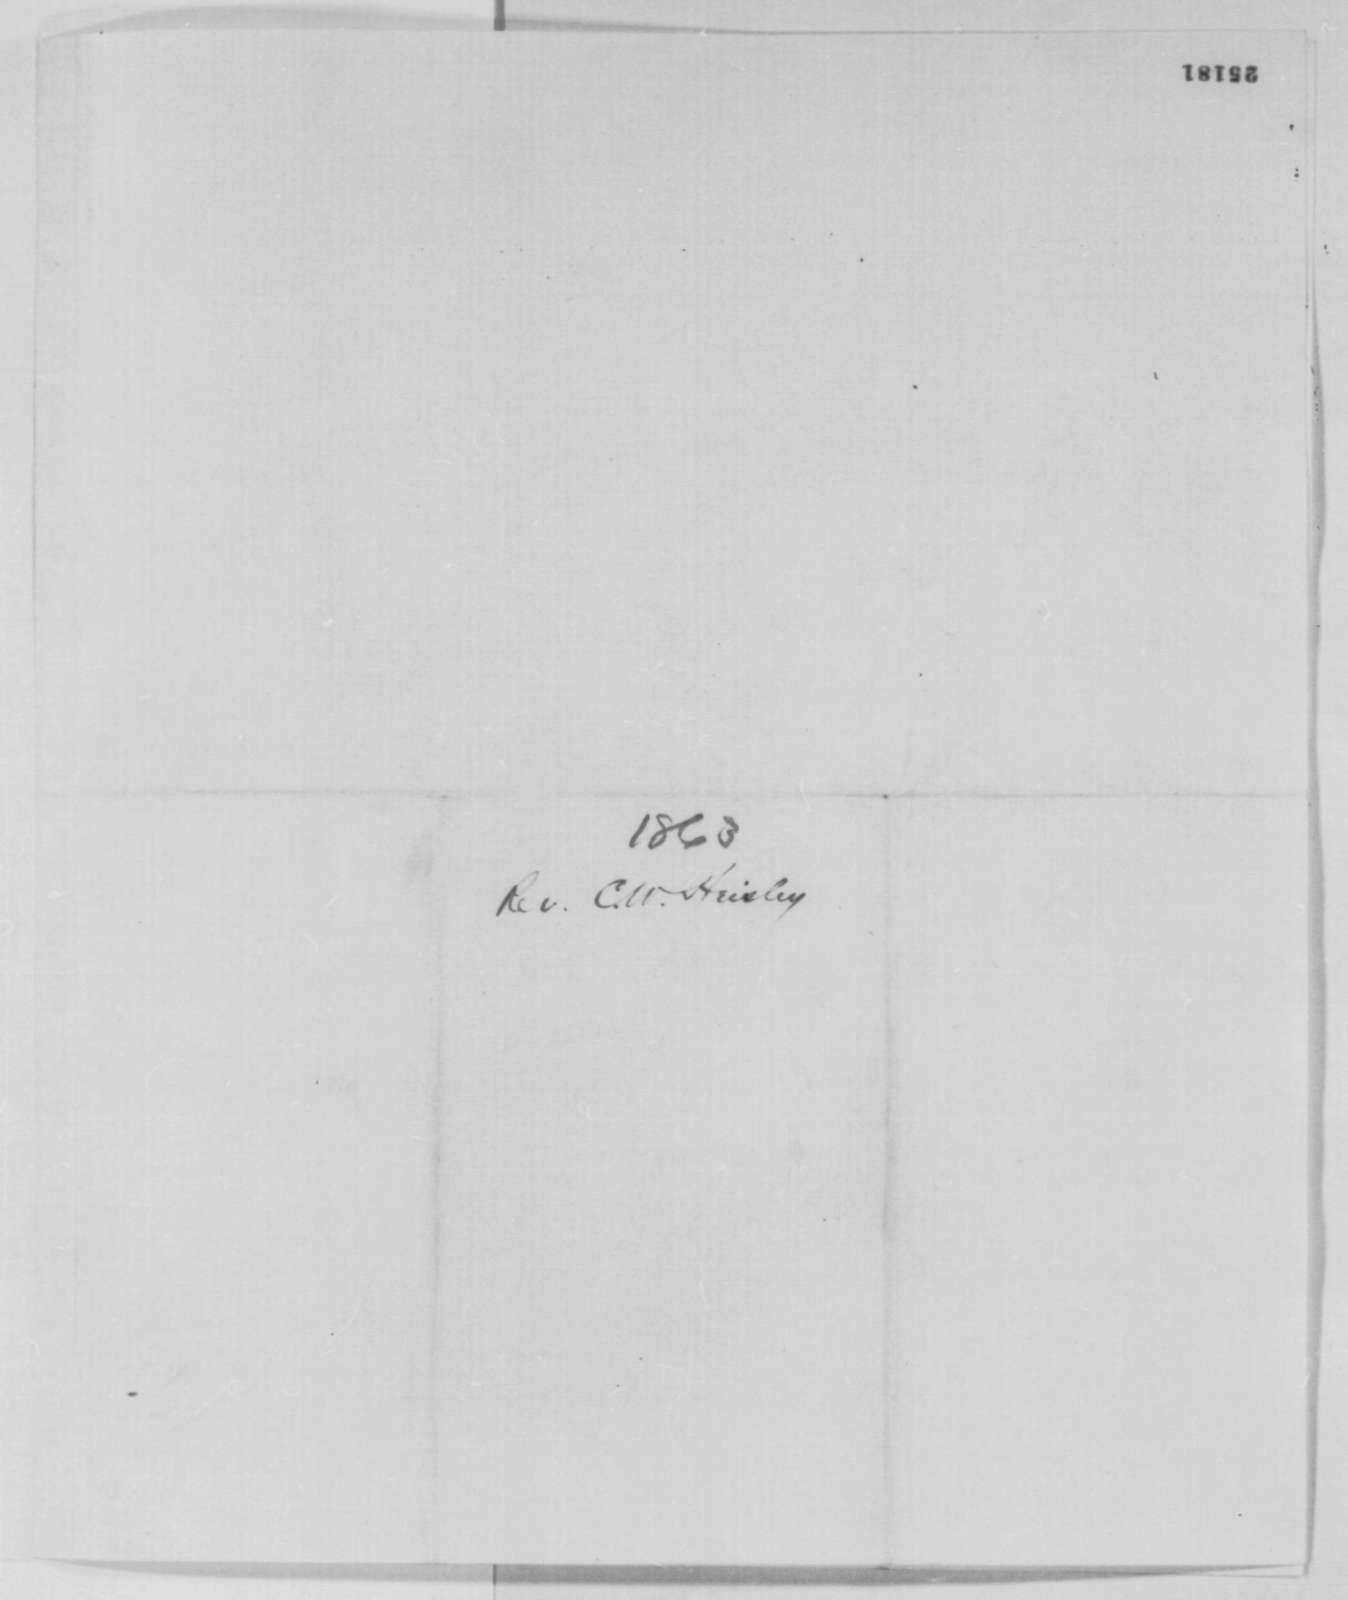 John T. Nixon to Abraham Lincoln, Monday, July 27, 1863  (Recommendation; endorsed by Lorenzo Thomas, July 28, 1863)